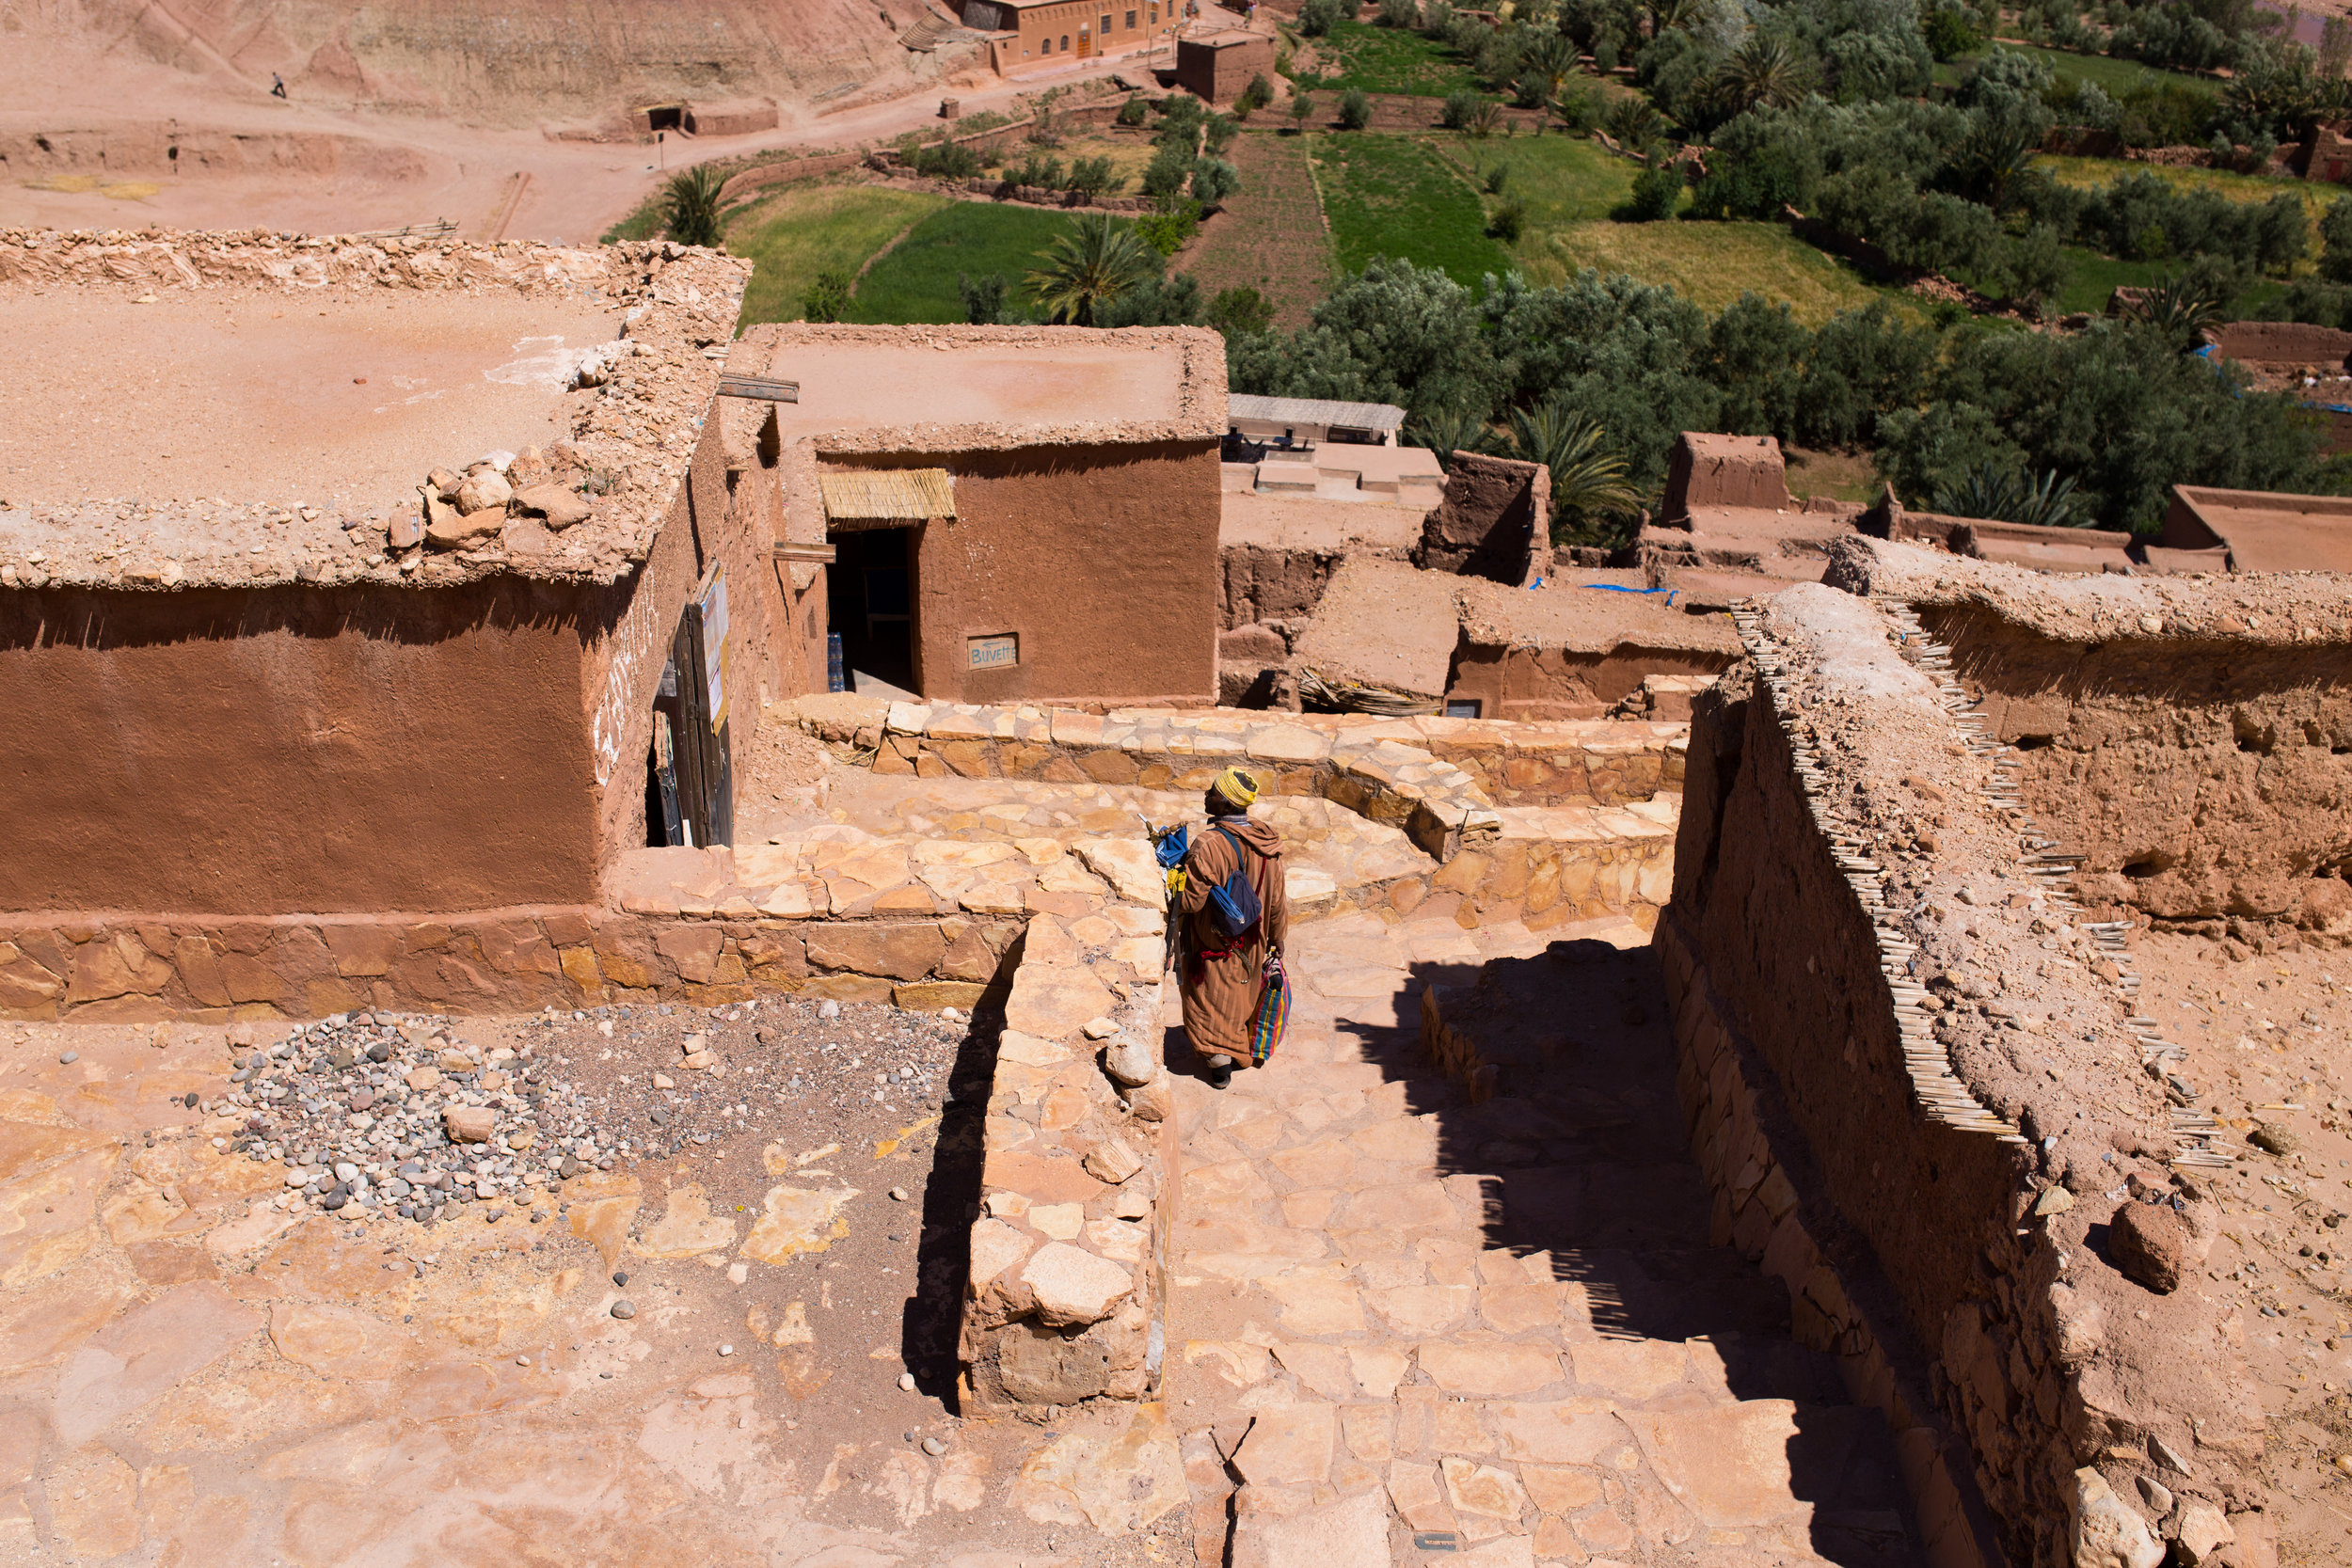 morocco-morocco travel-visit morocco-travel-travel photography-travel photographer-alina mendoza-alina mendoza photography-41.jpg